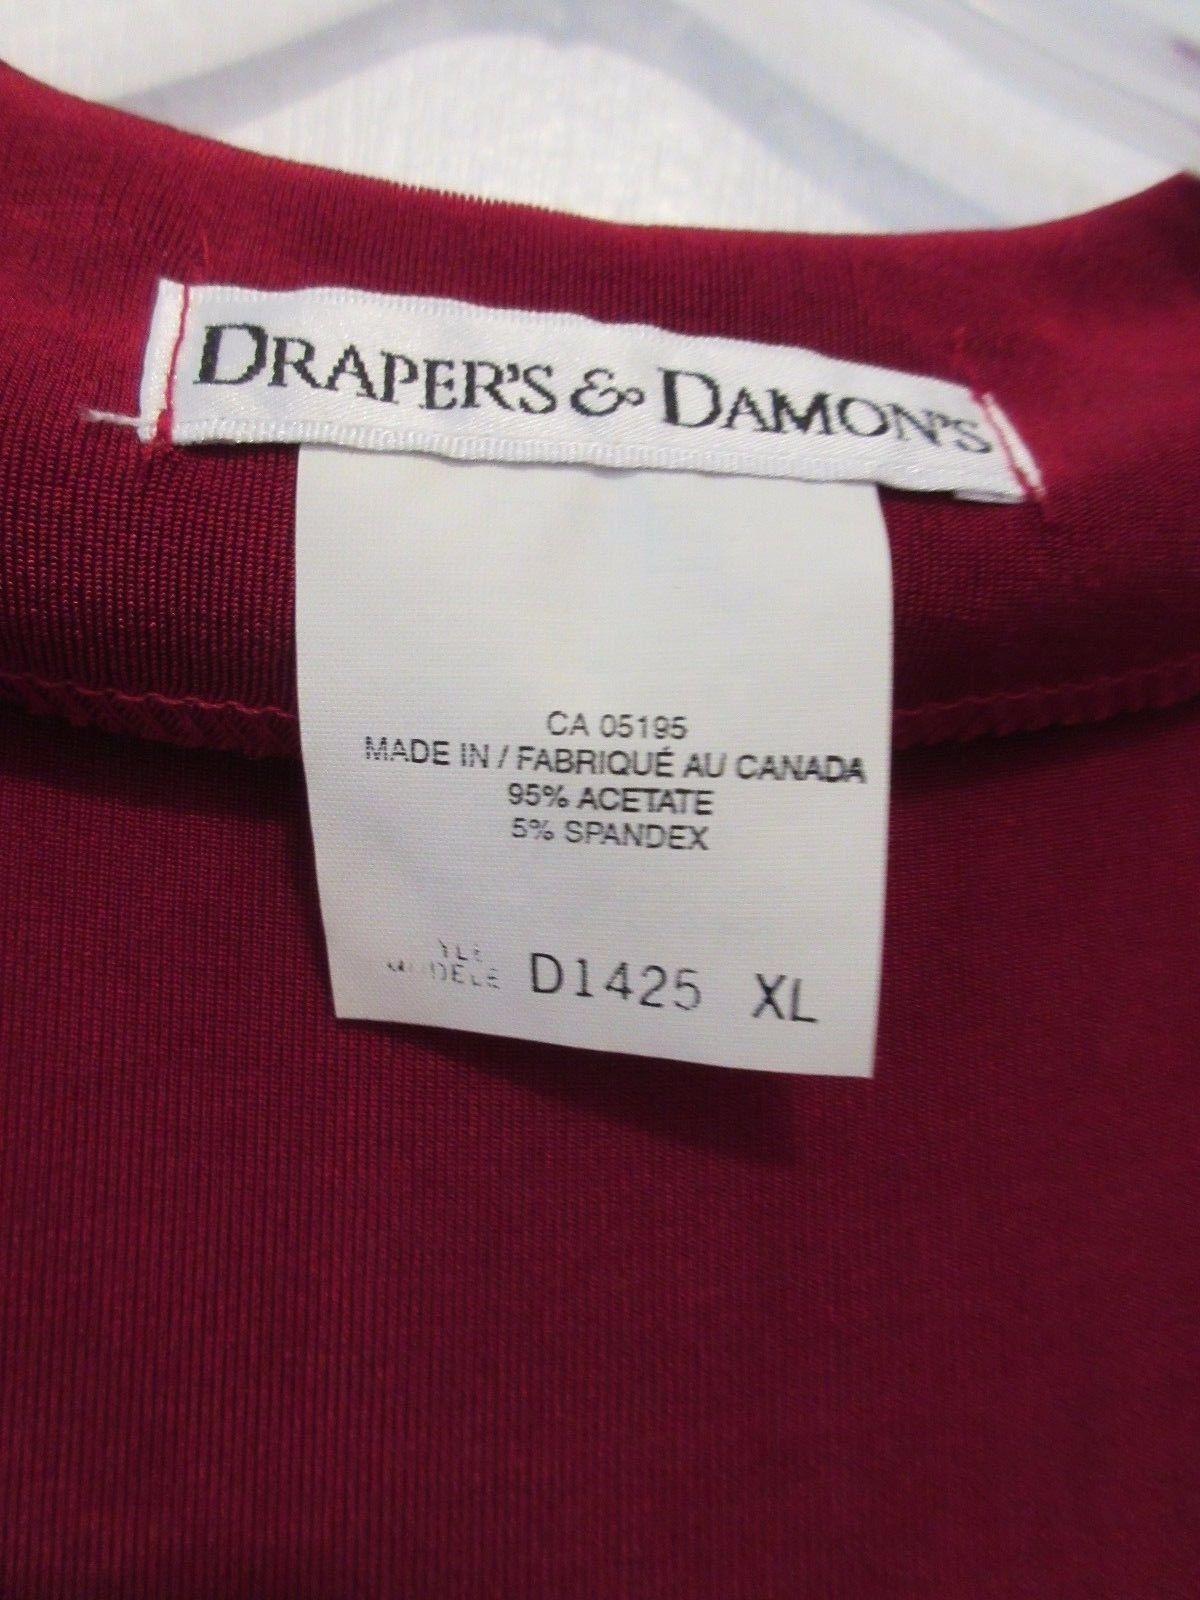 DRAPER'S & DAMON WOMEN'S PLUS SIZE XL RED LONG SLEEVE JACKET / CARDIGAN - NWT